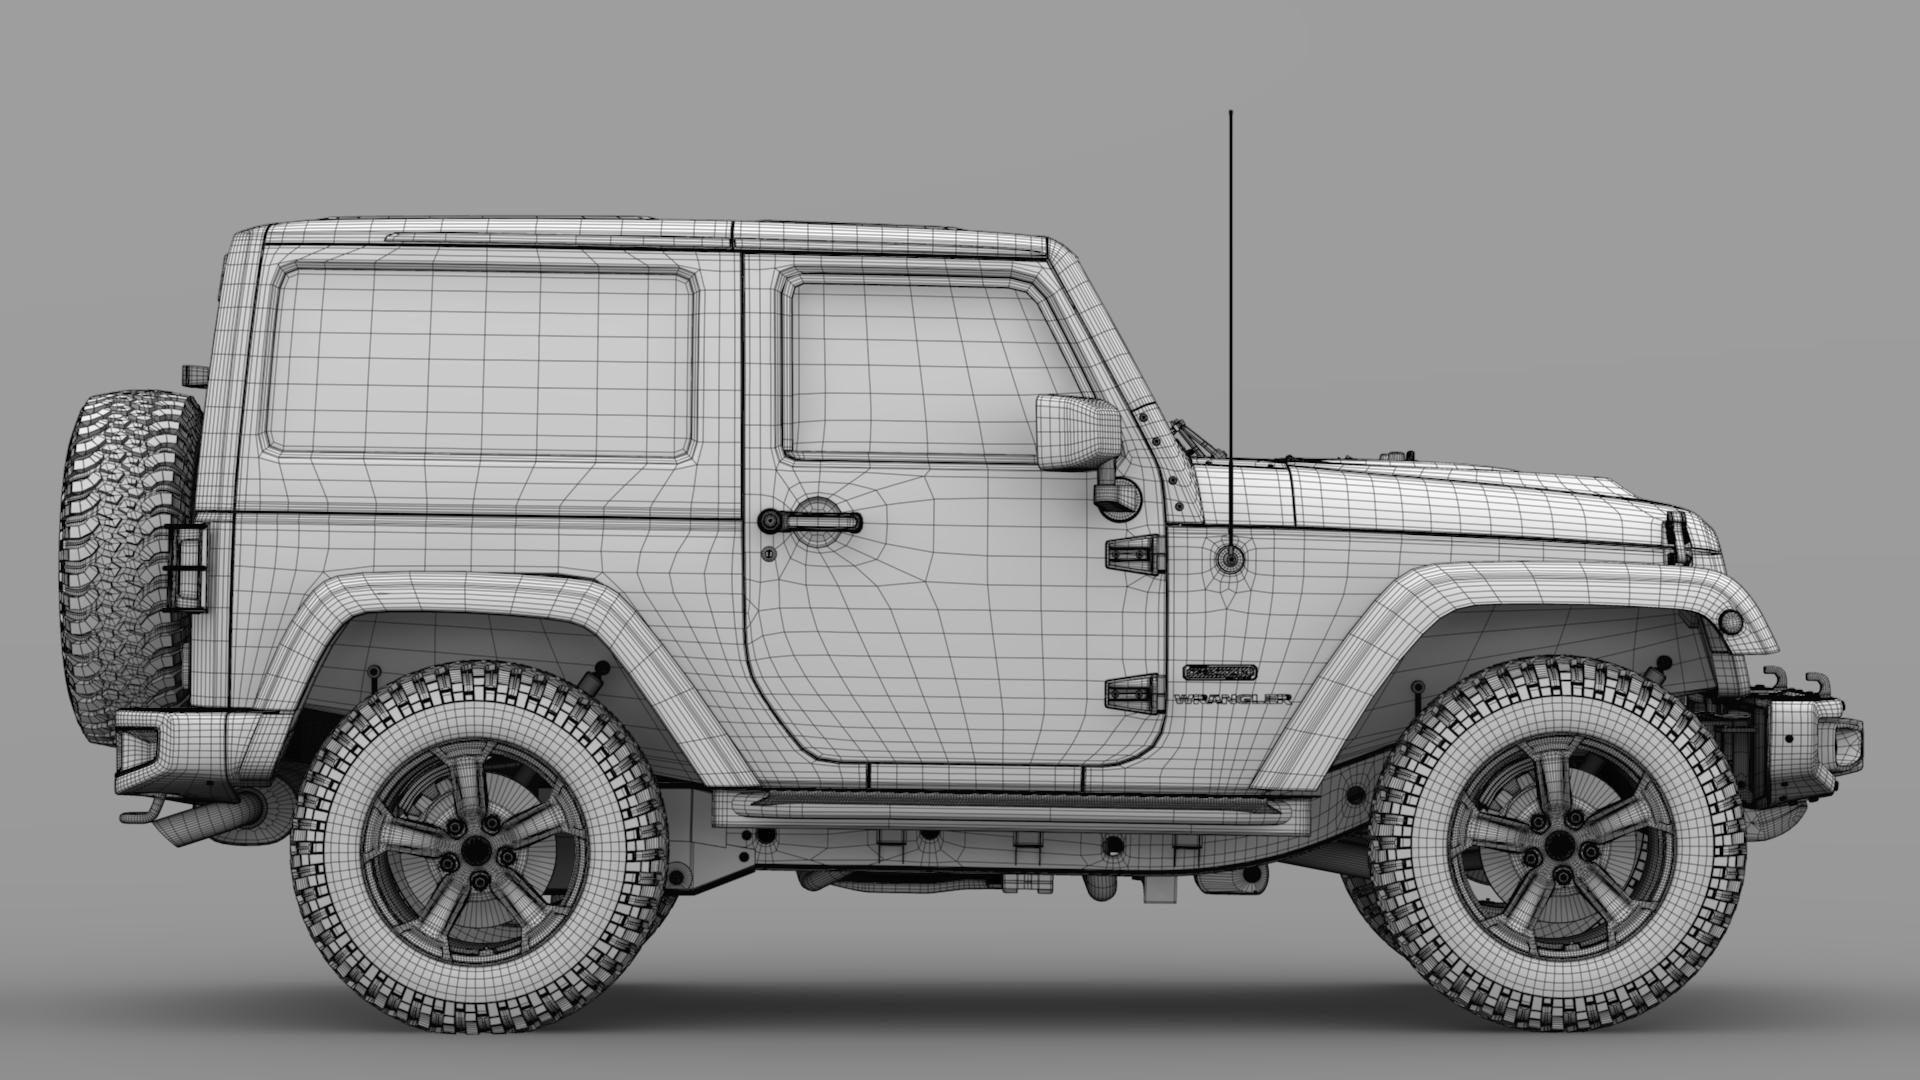 jeep wrangler rubicon recon jk 2017 3d model max fbx lwo ma mb hrc xsi obj 276953